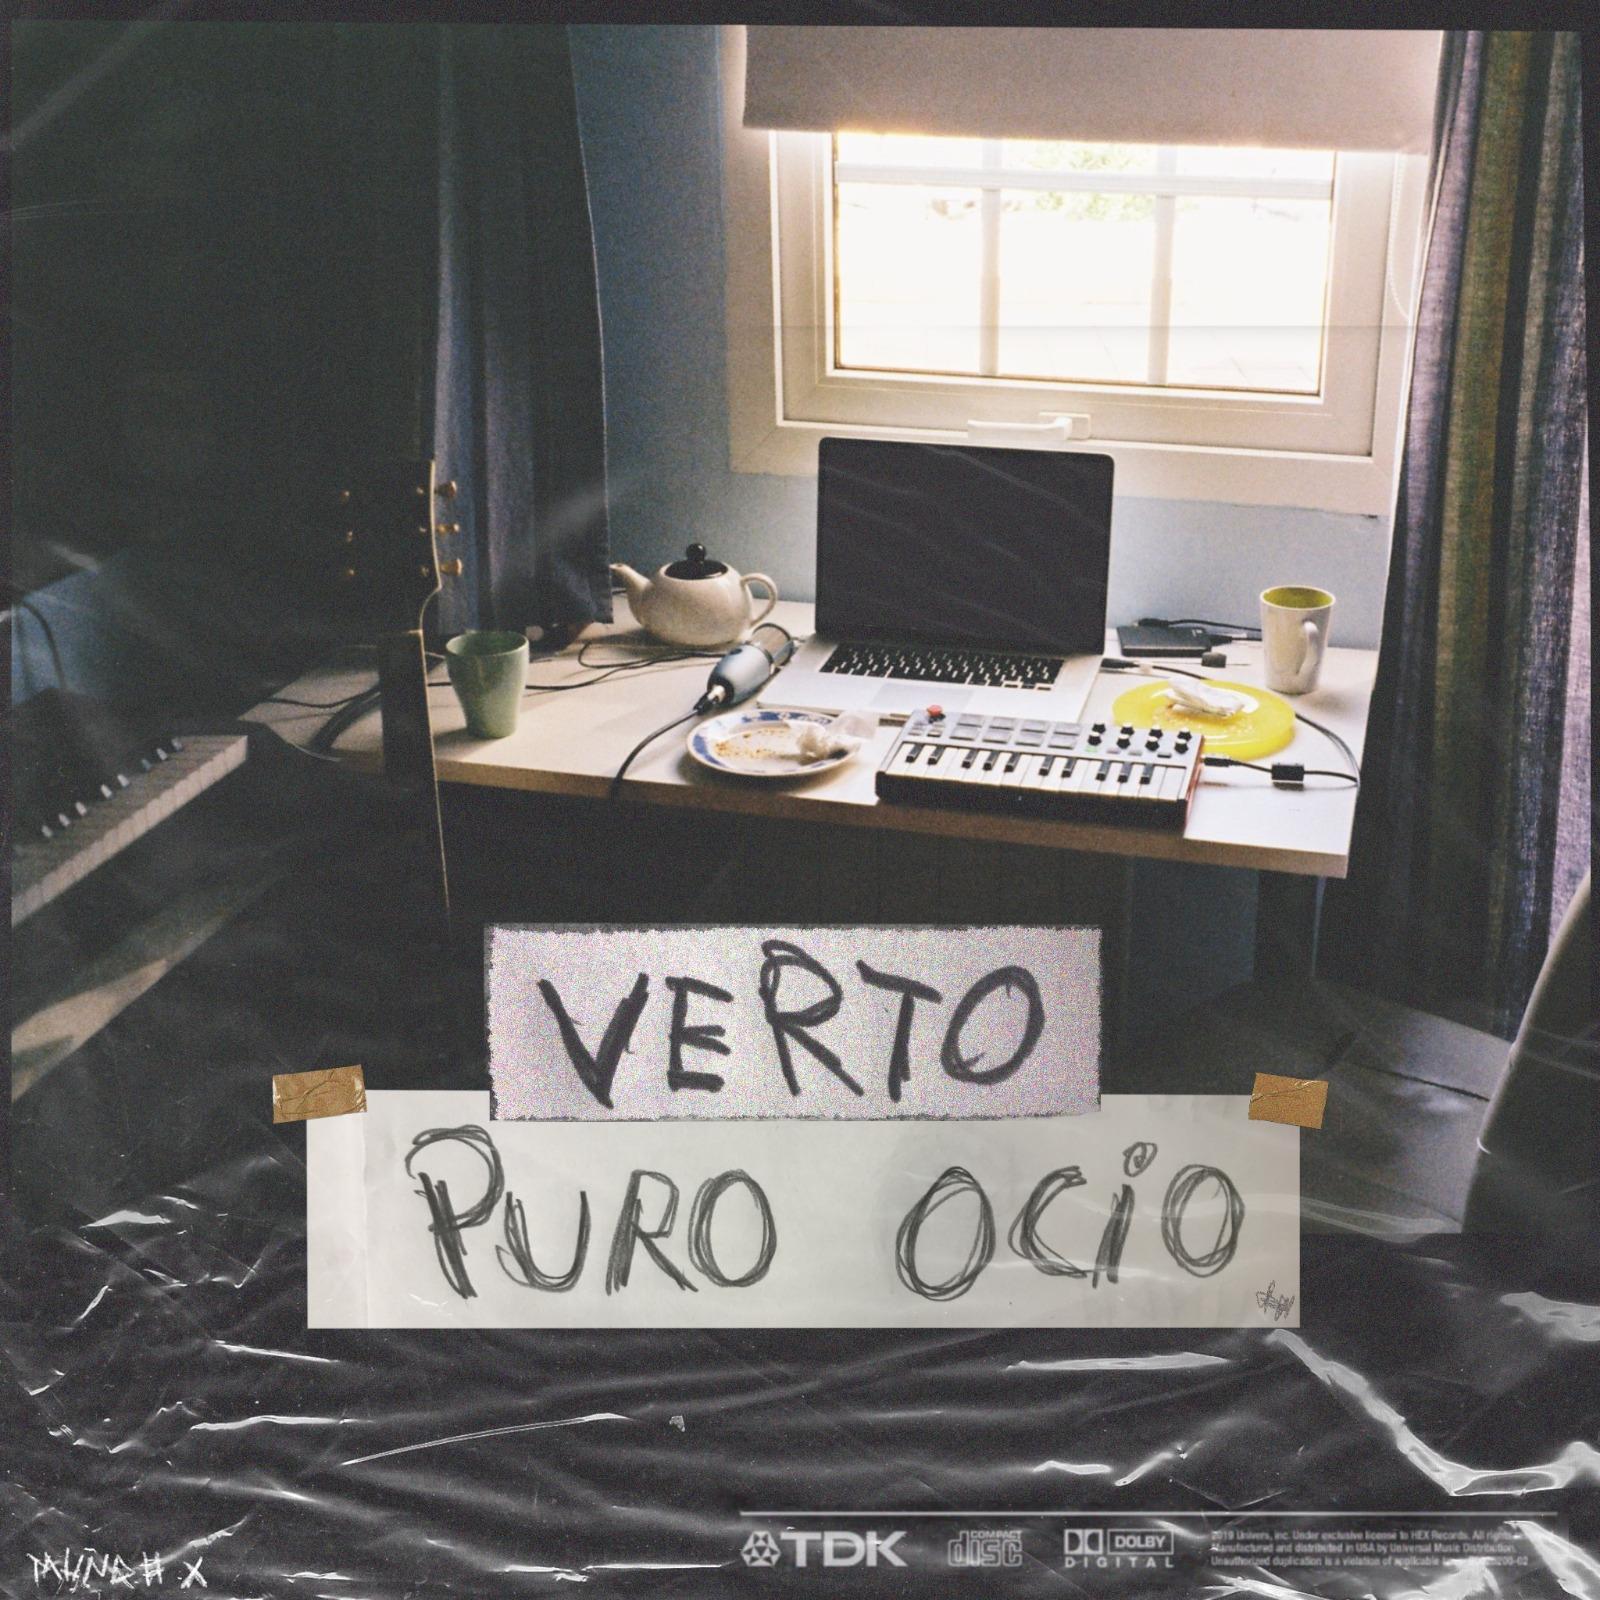 <i>Puro Ocio</i> é o debut discográfico de Verto